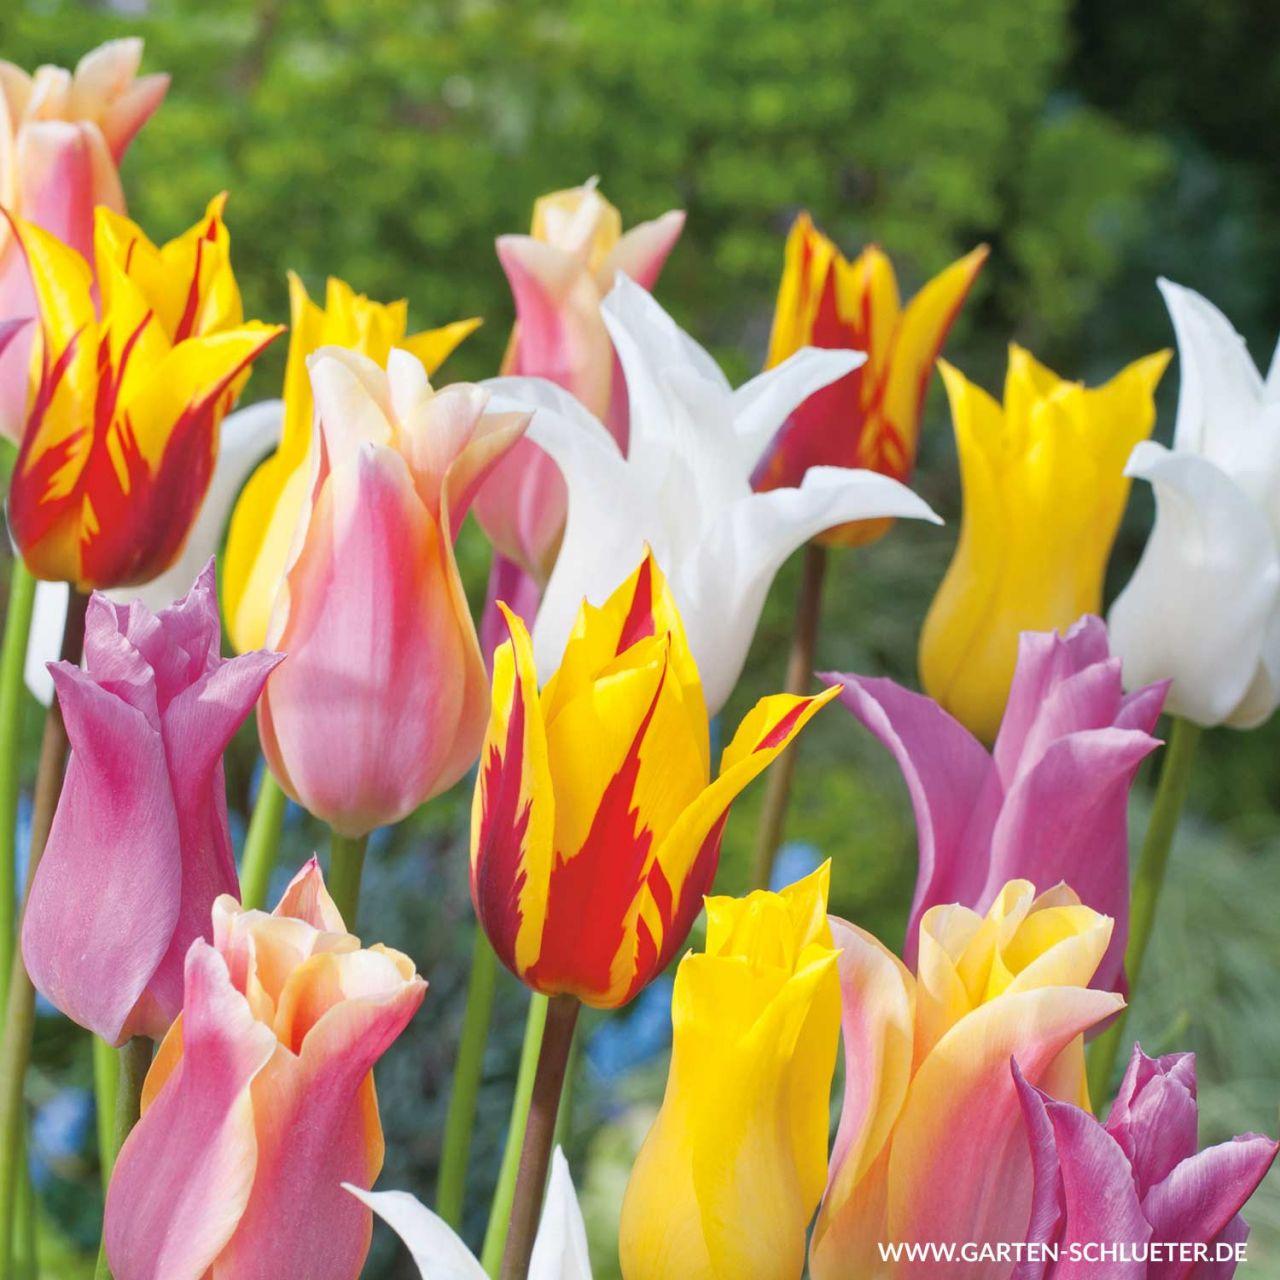 Lilienblütige Tulpen 'Mischung' - 7 Stück